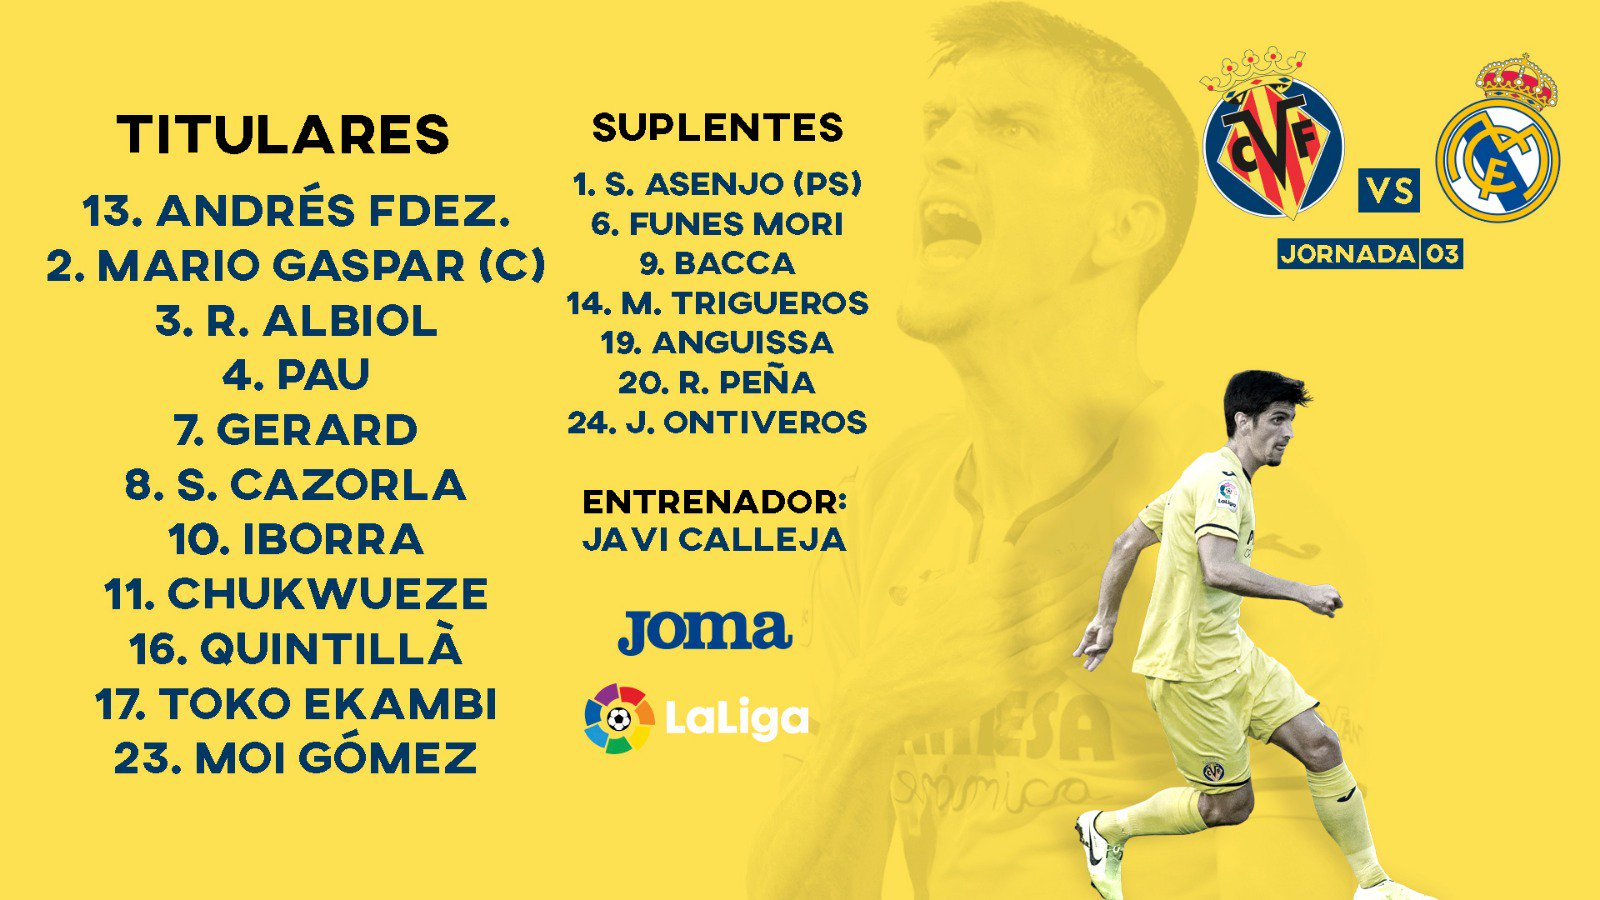 VILLARREAL REAL MADRID - Villarreal-Real Madrid EN DIRECTO